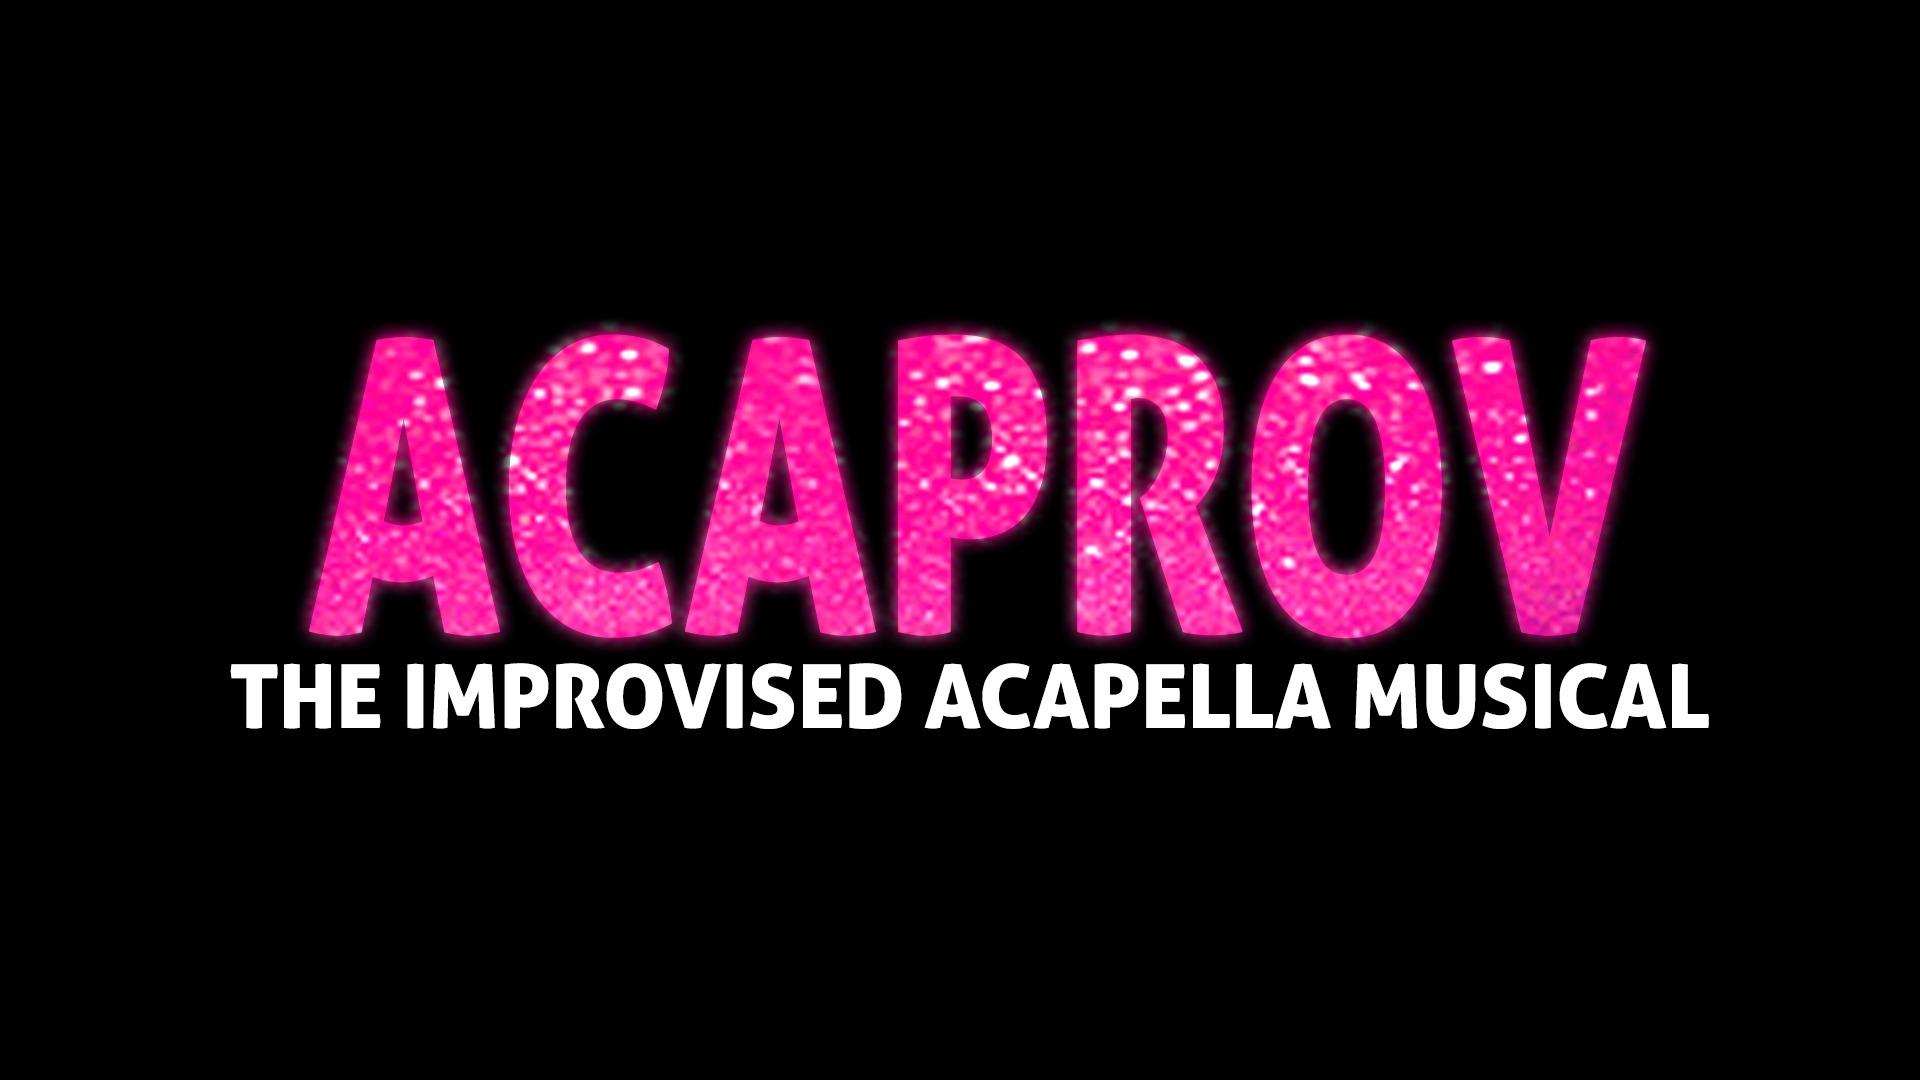 Acaprov: The Improvised Acapella Musical